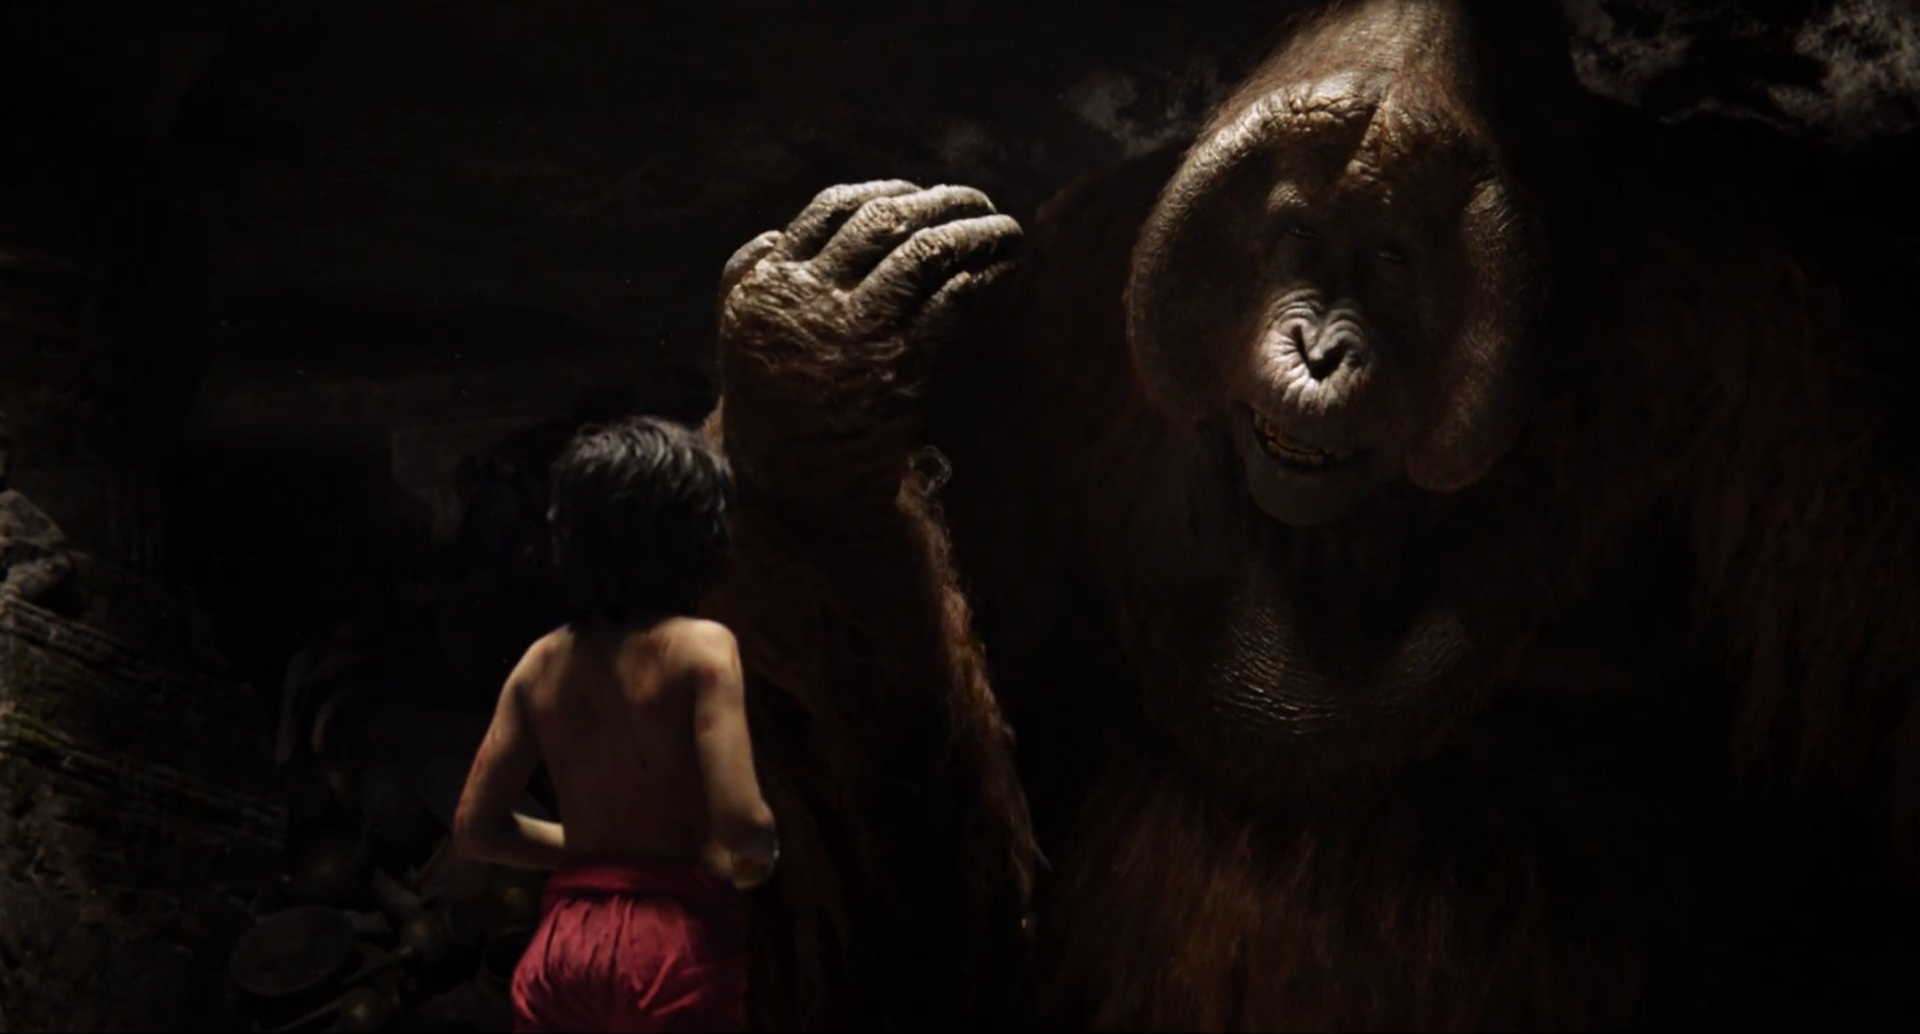 King Louie, Mowgli, Christopher Walken, Neel Sethi, Disney's The Jungle Book